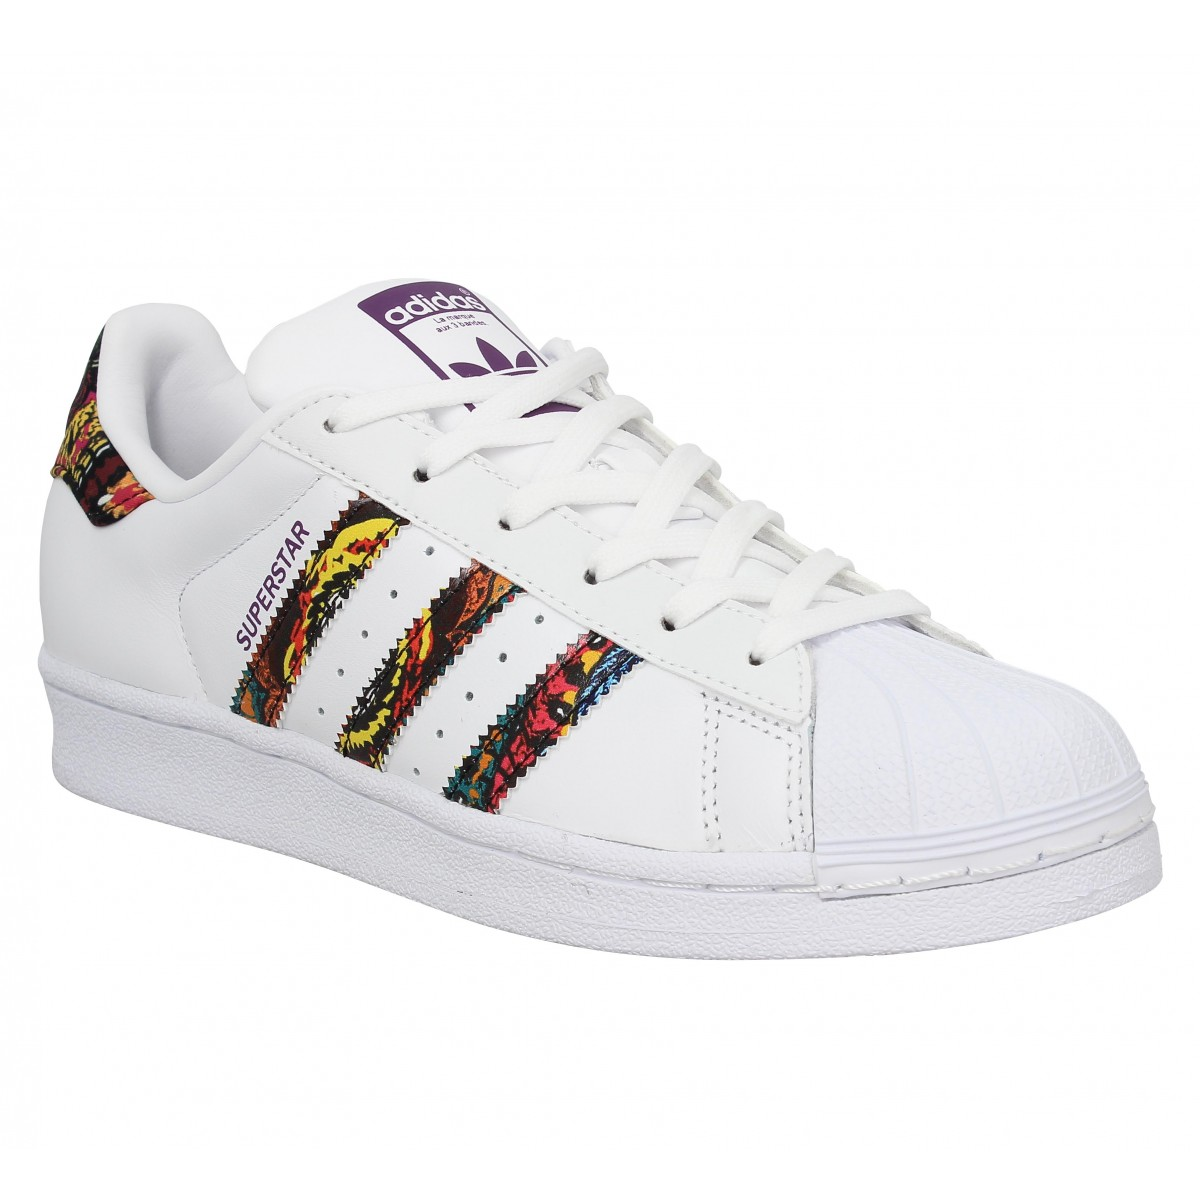 Adidas Femme Superstar-36-blanc Pourpre